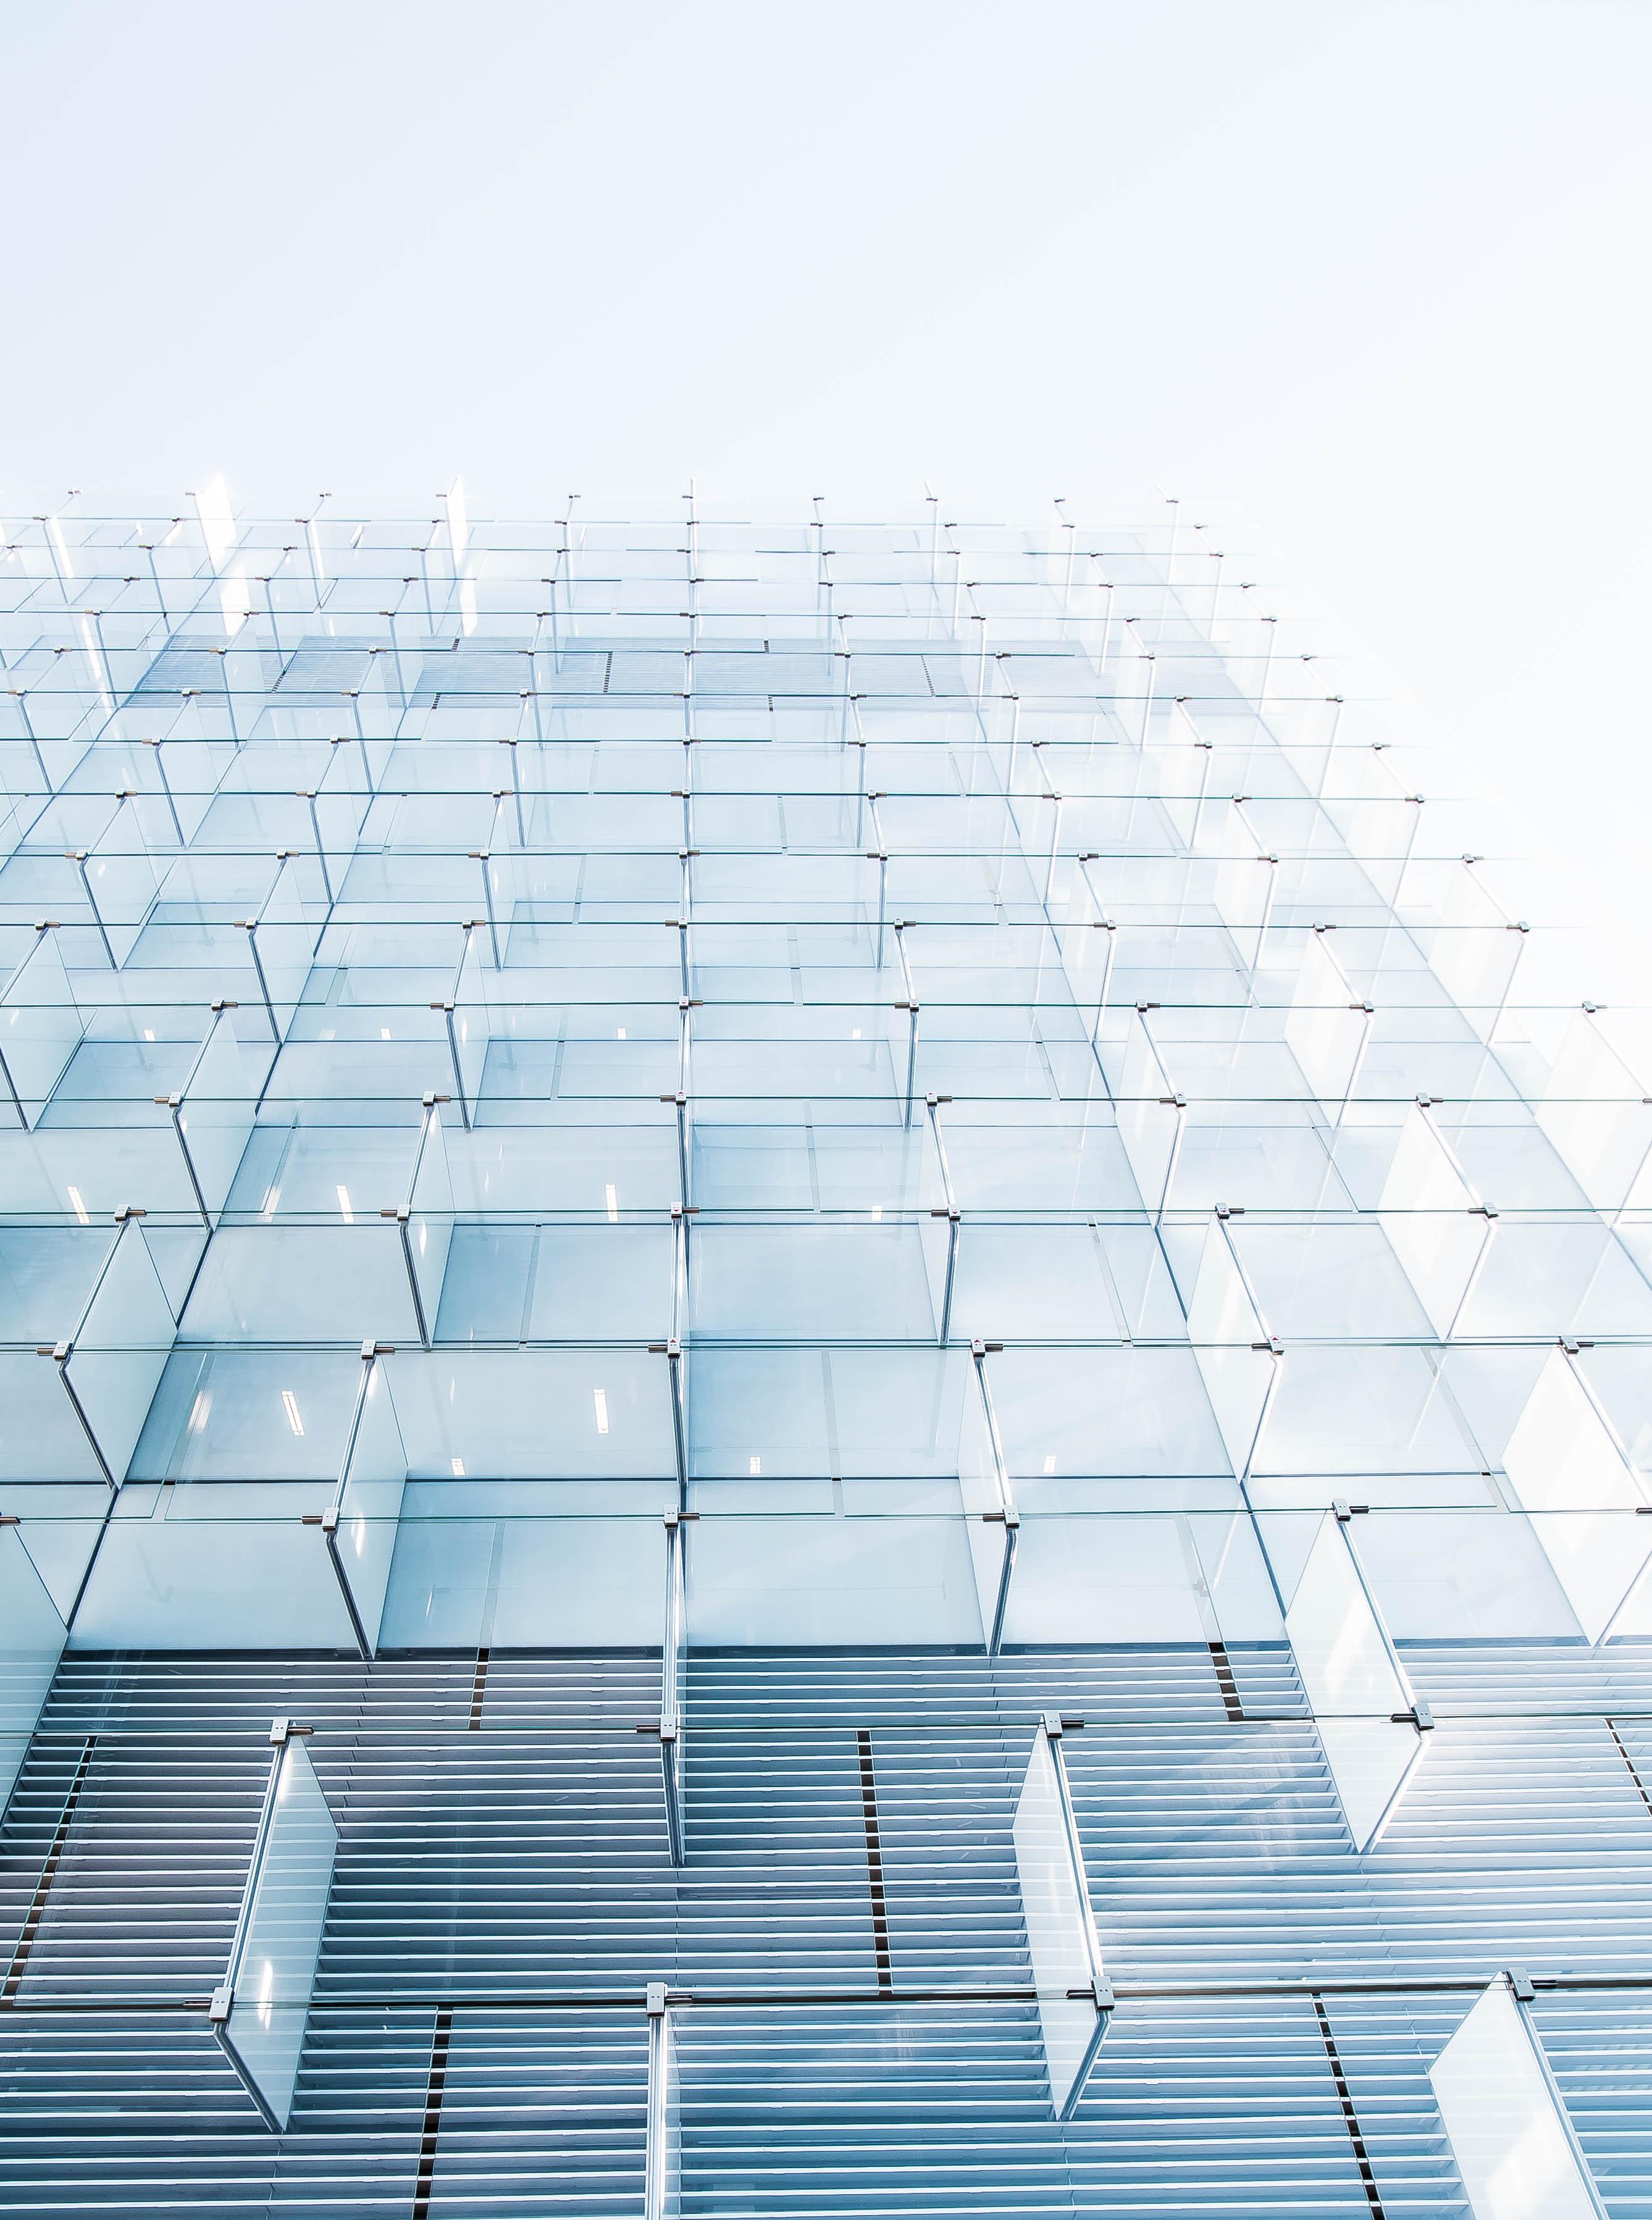 Free Images Architecture Glass Building Skyscraper